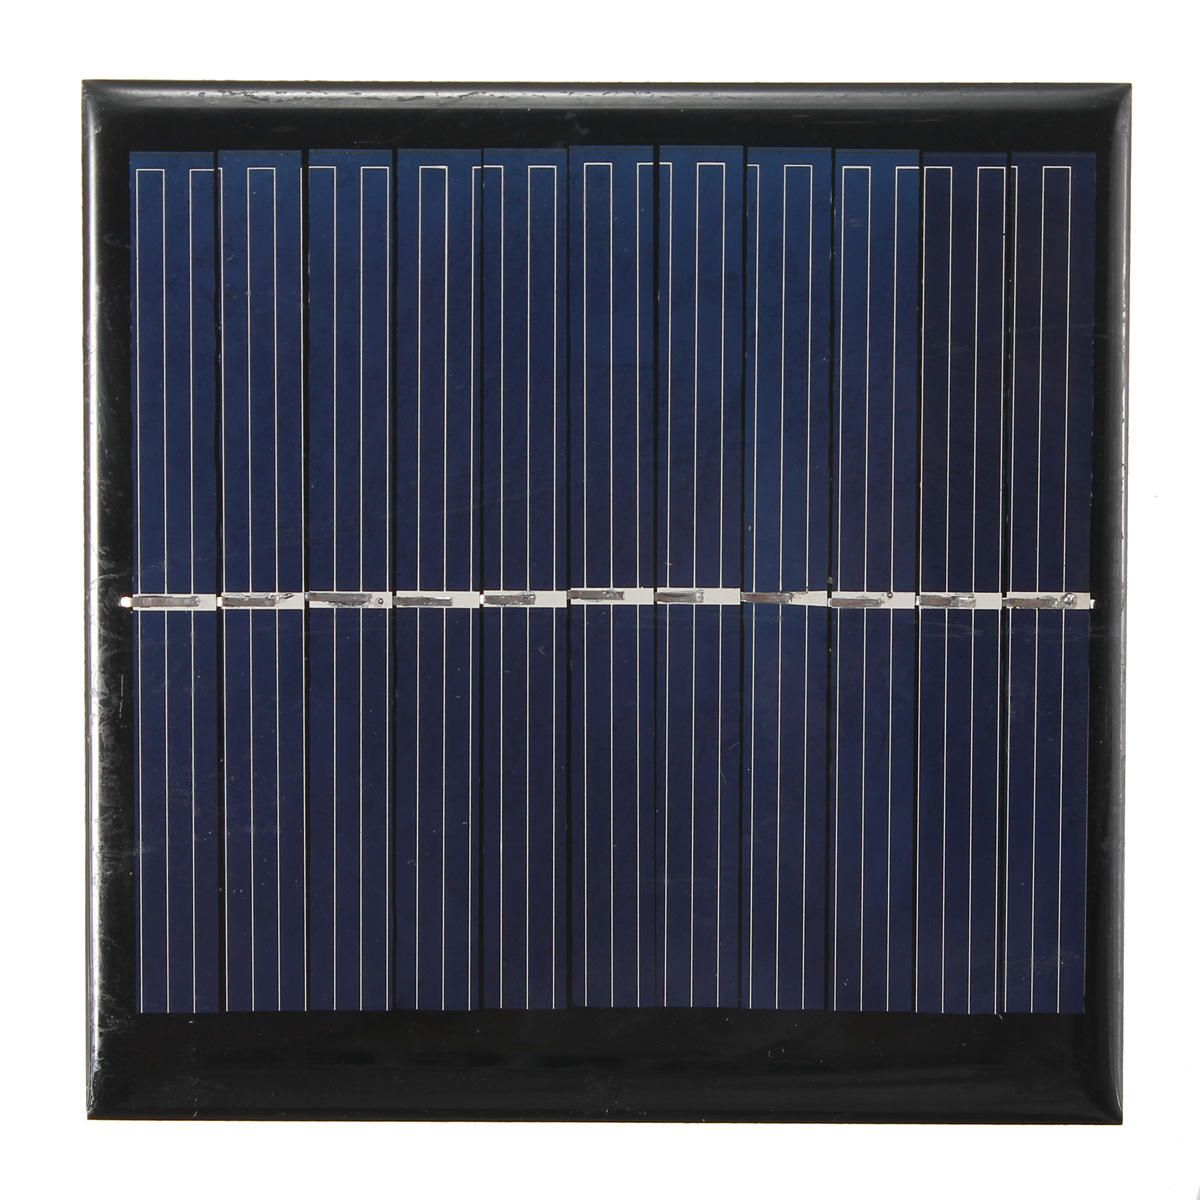 5pcs 5 5v 1w 180ma Polycrystalline 95mm X 95mm Mini Solar Panel Photovoltaic Panel Electronic Components Diy Kits From Electronics On Banggood Com